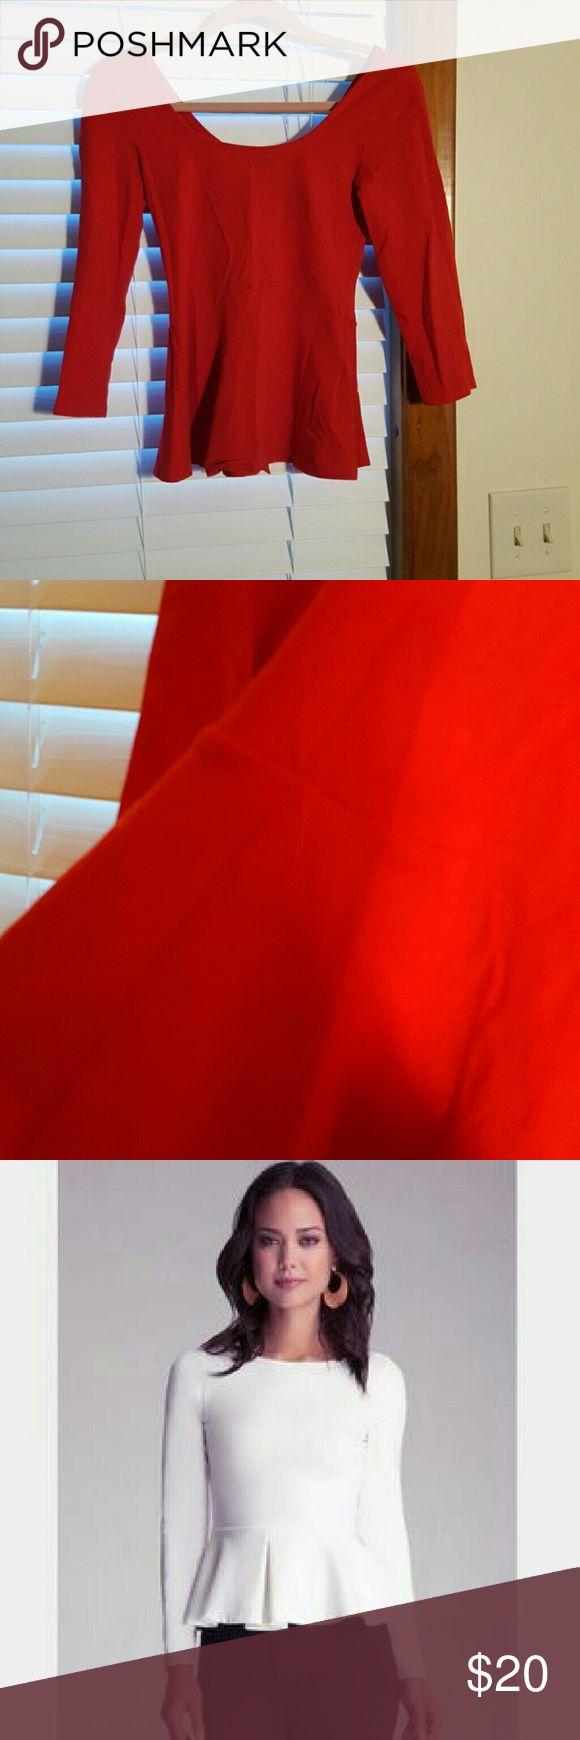 Express Red Peplum Top Slimming long sleeve red peplum top Express Tops Blouses